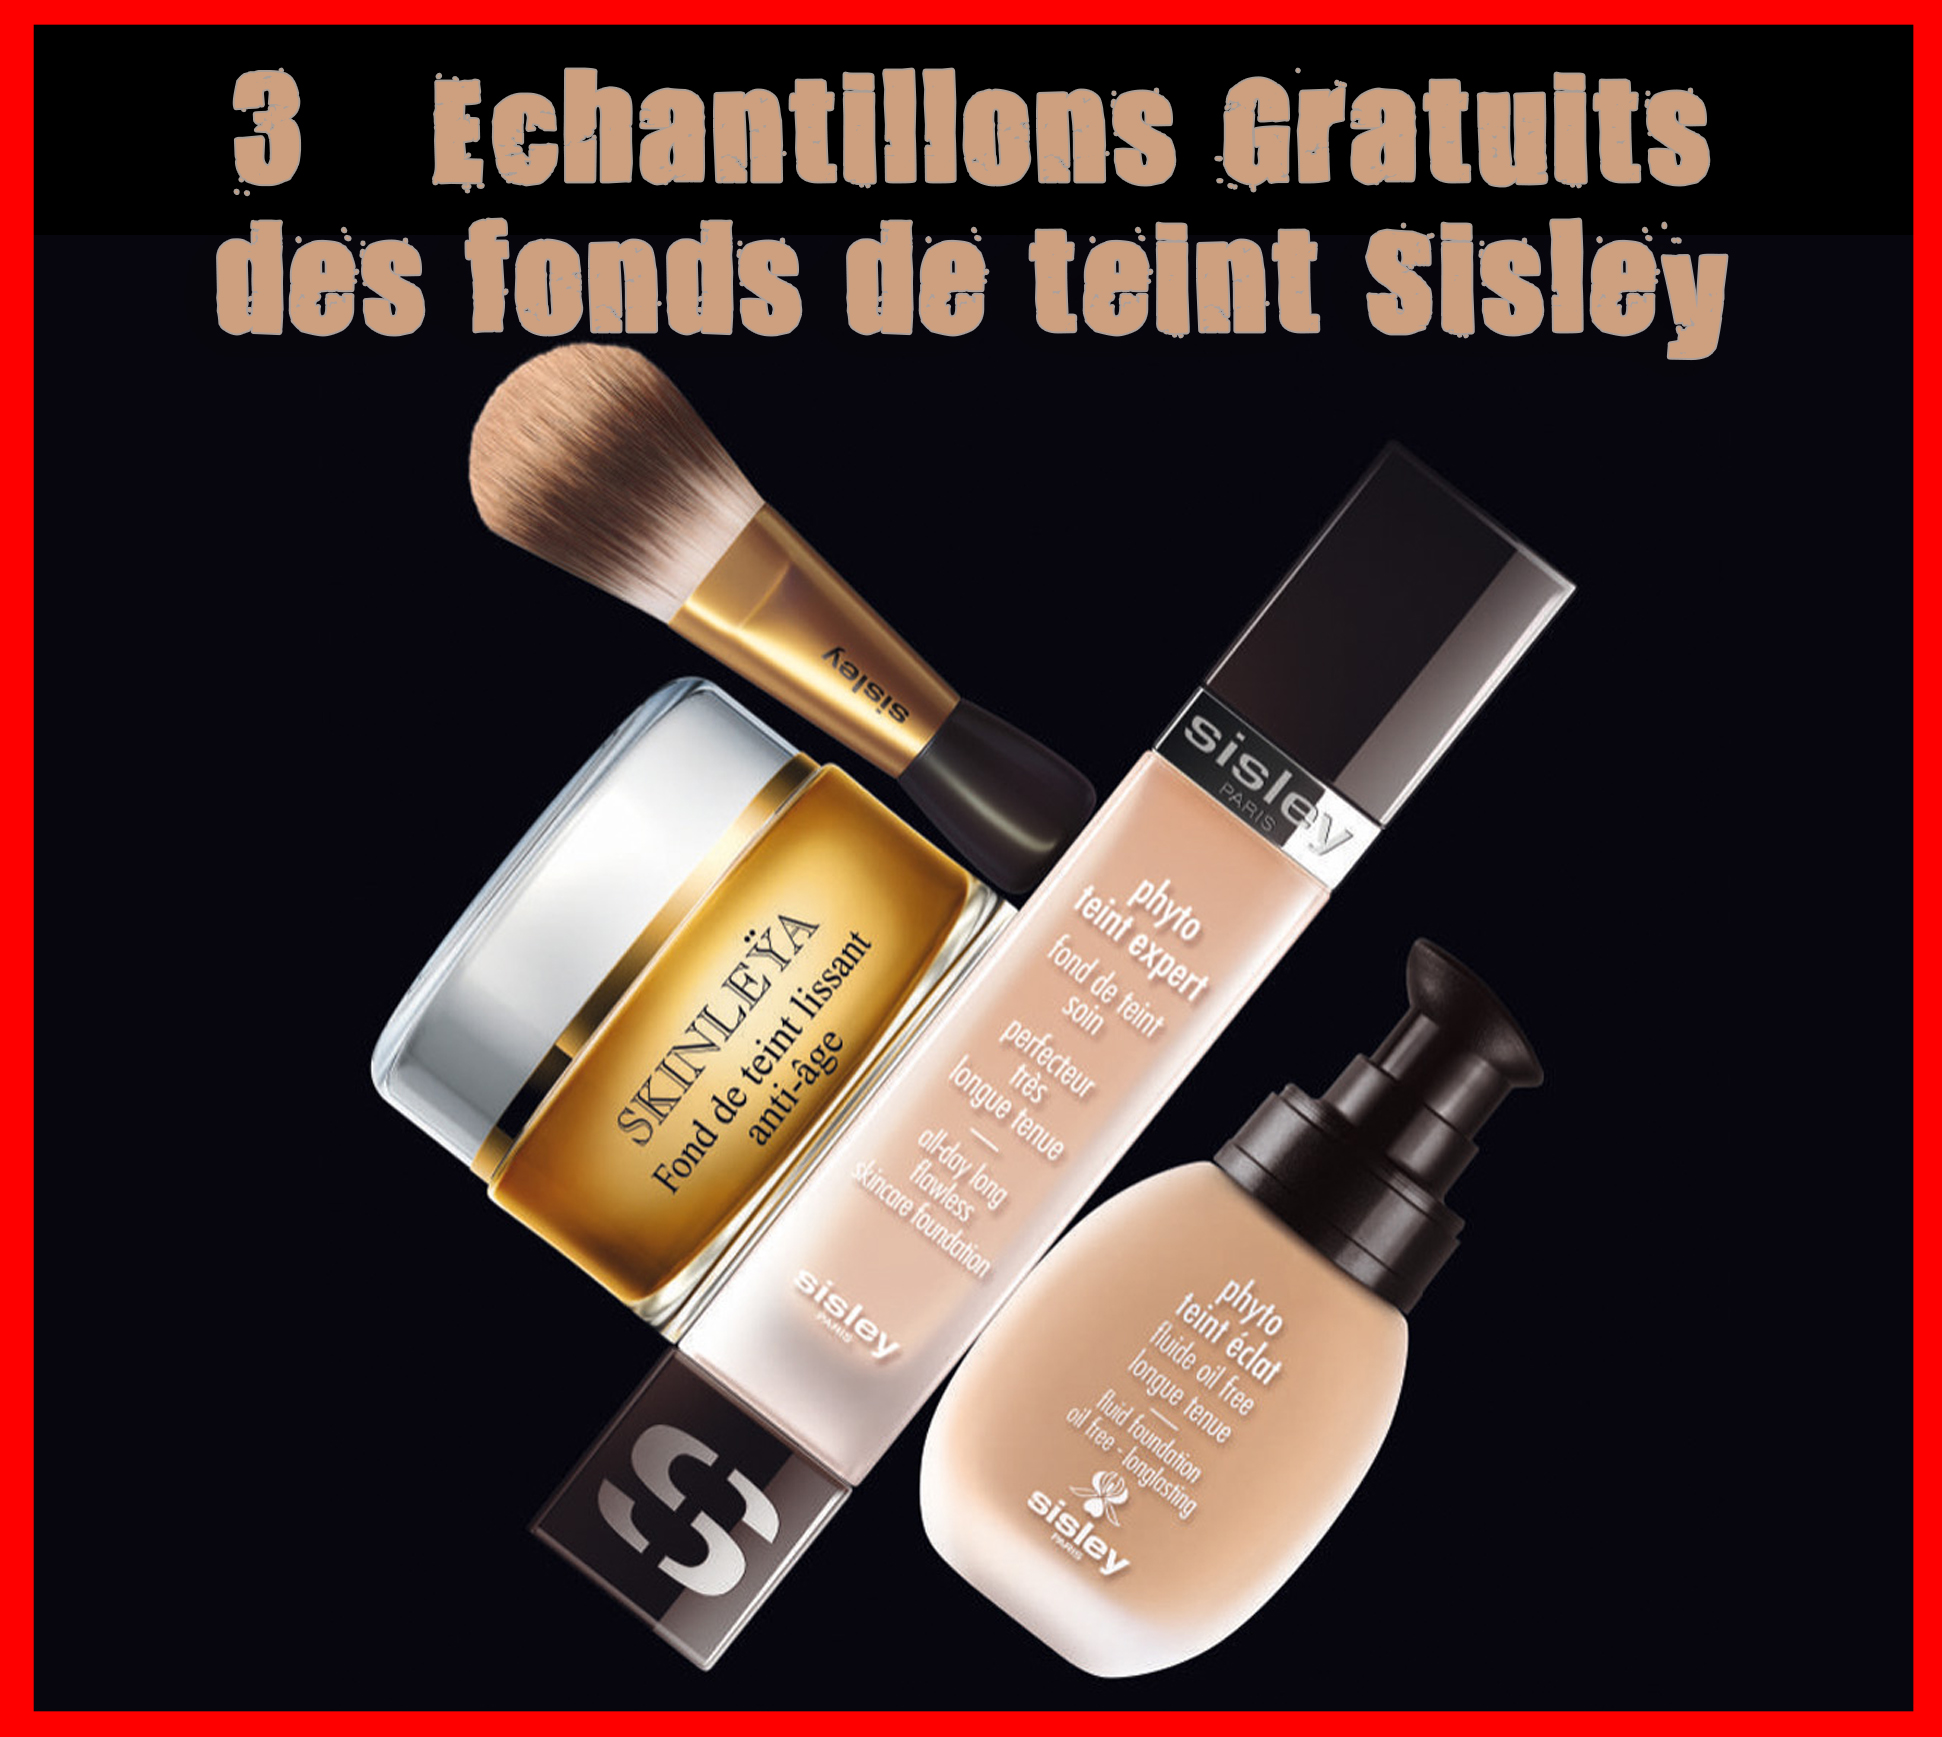 3 Échantillons Gratuits de la gamme des fonds de teint Sisley